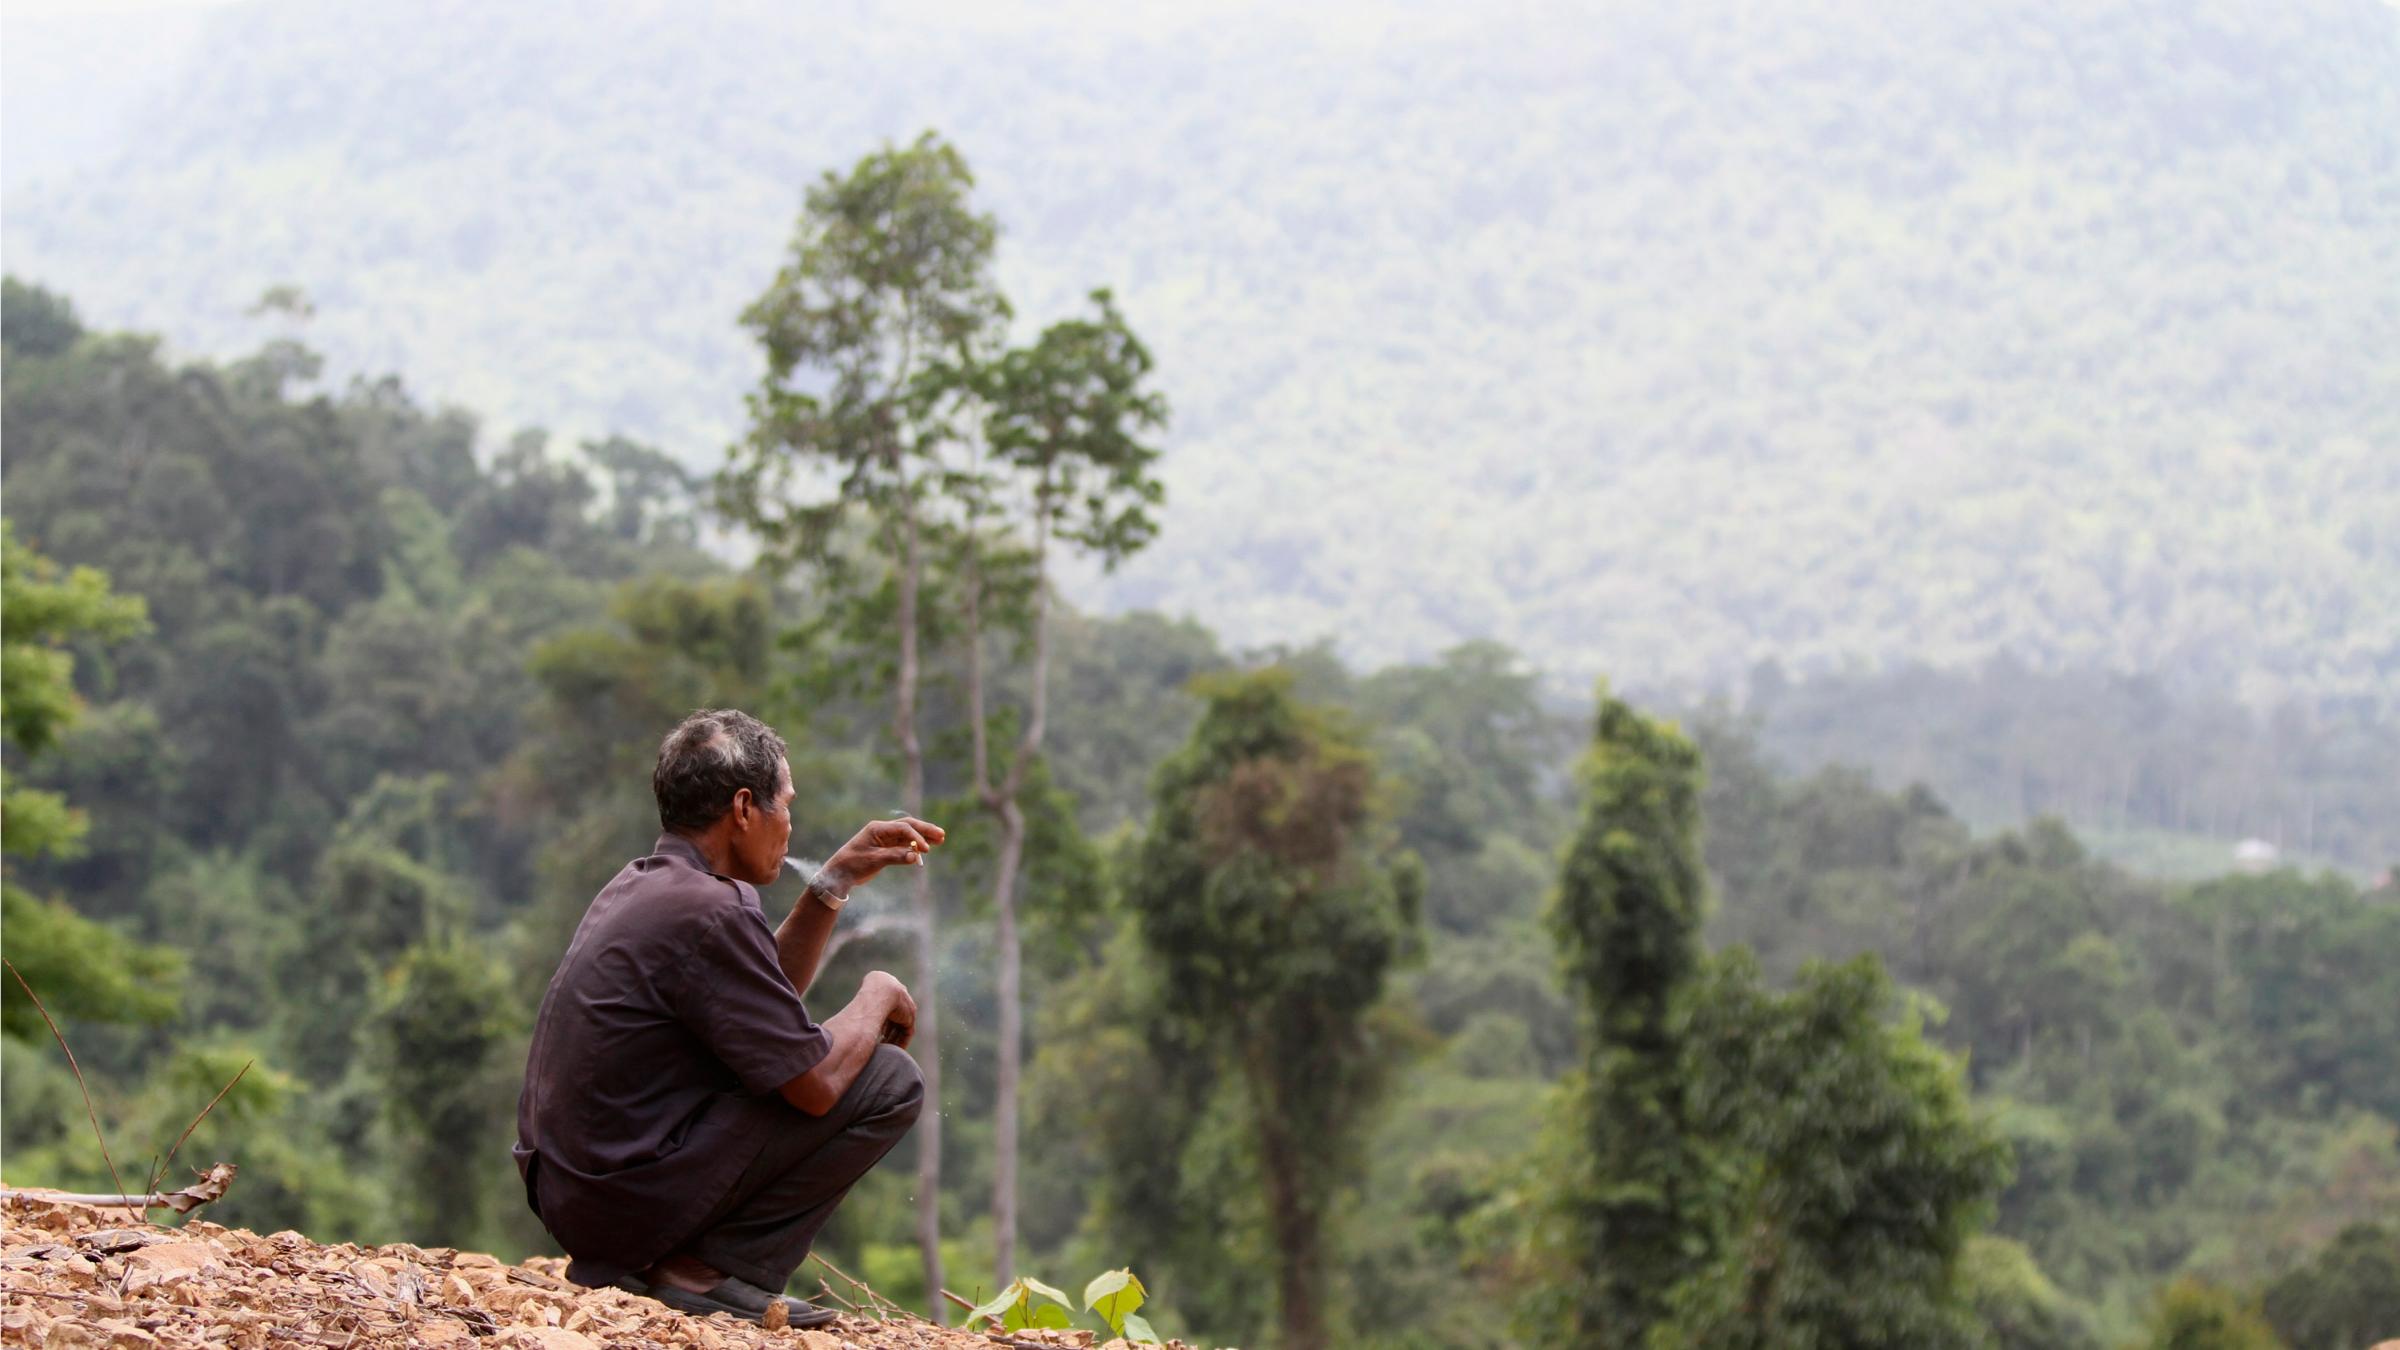 Man looks out onto vegetation